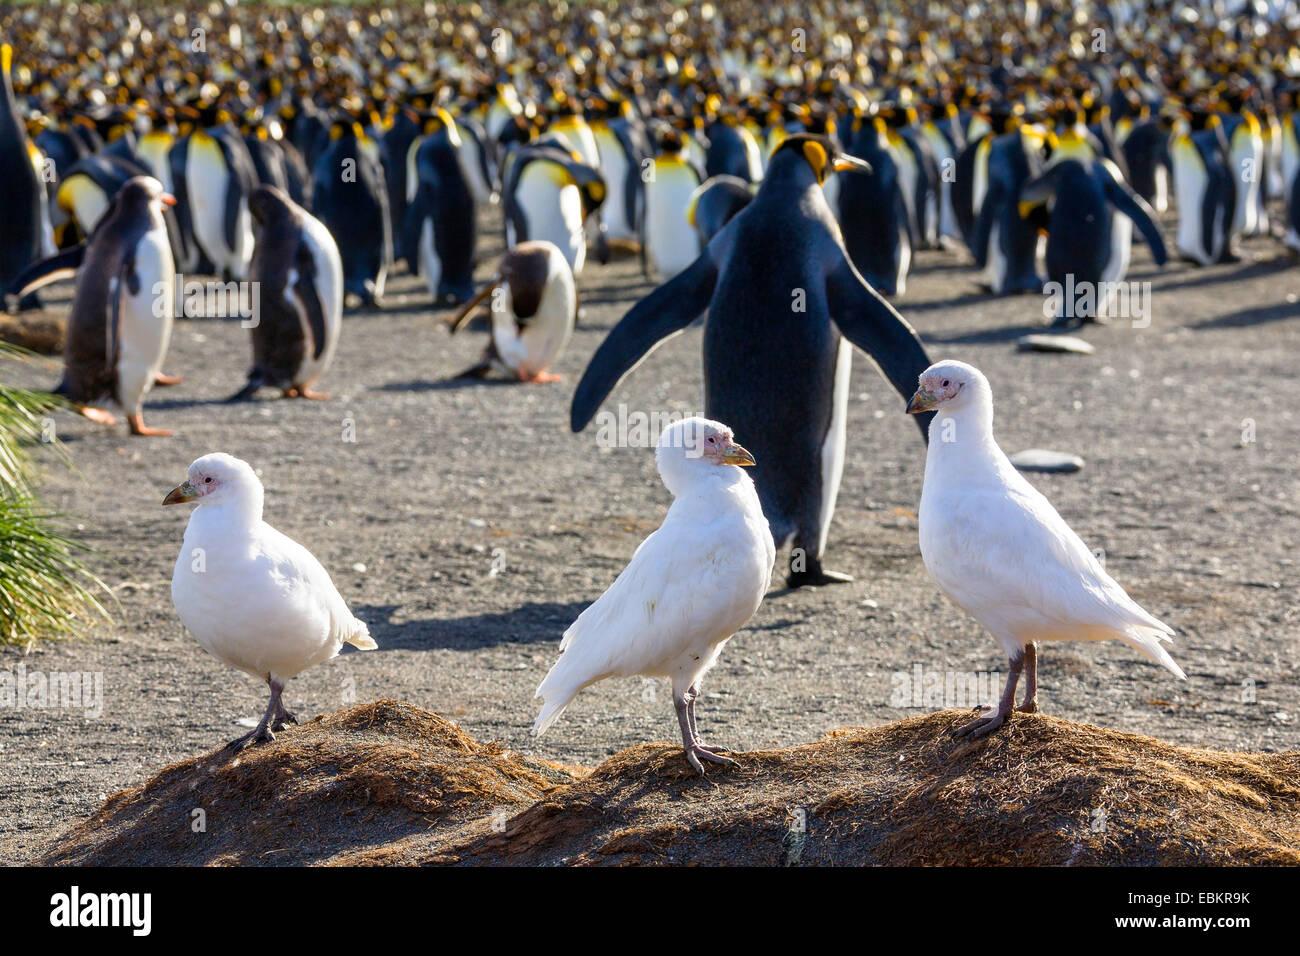 Snowy Sheathbill, Pale-faced sheathbill, Paddy (Chionis alba), three sheathbills in front of a king penguin colony, - Stock Image